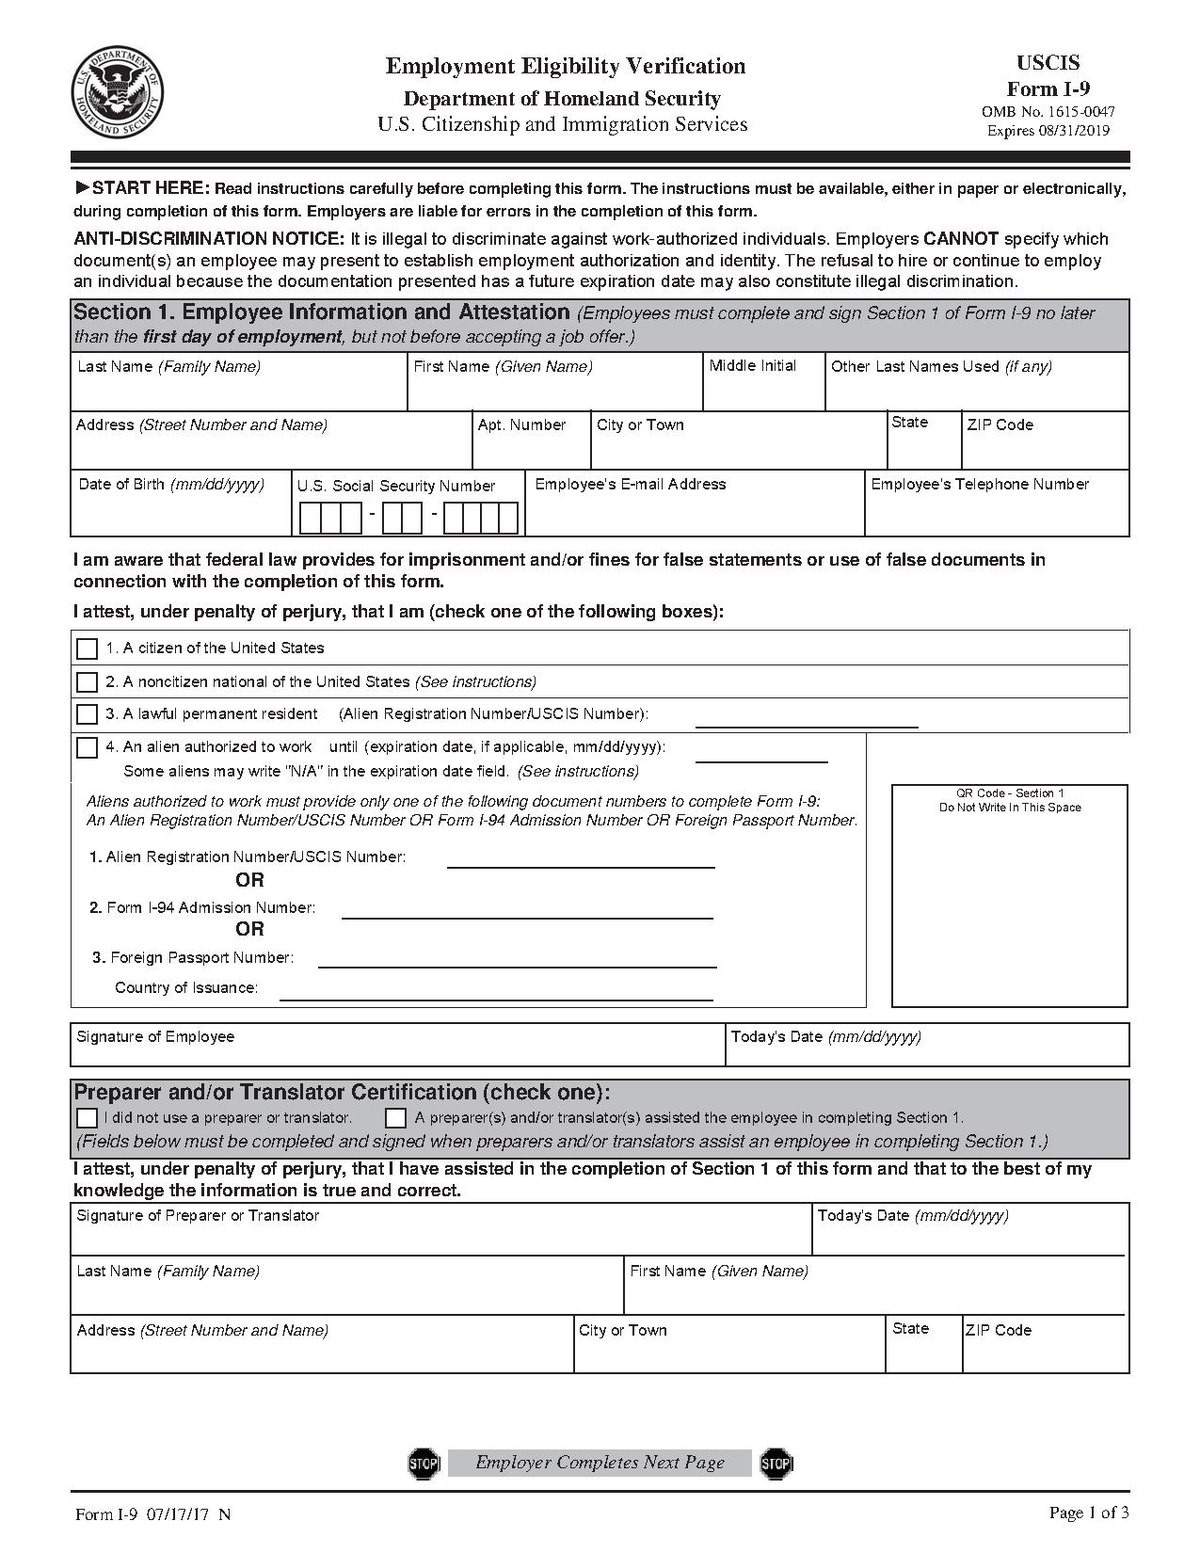 form i-9 verification  Form I-9 - Wikipedia - form i-9 verification